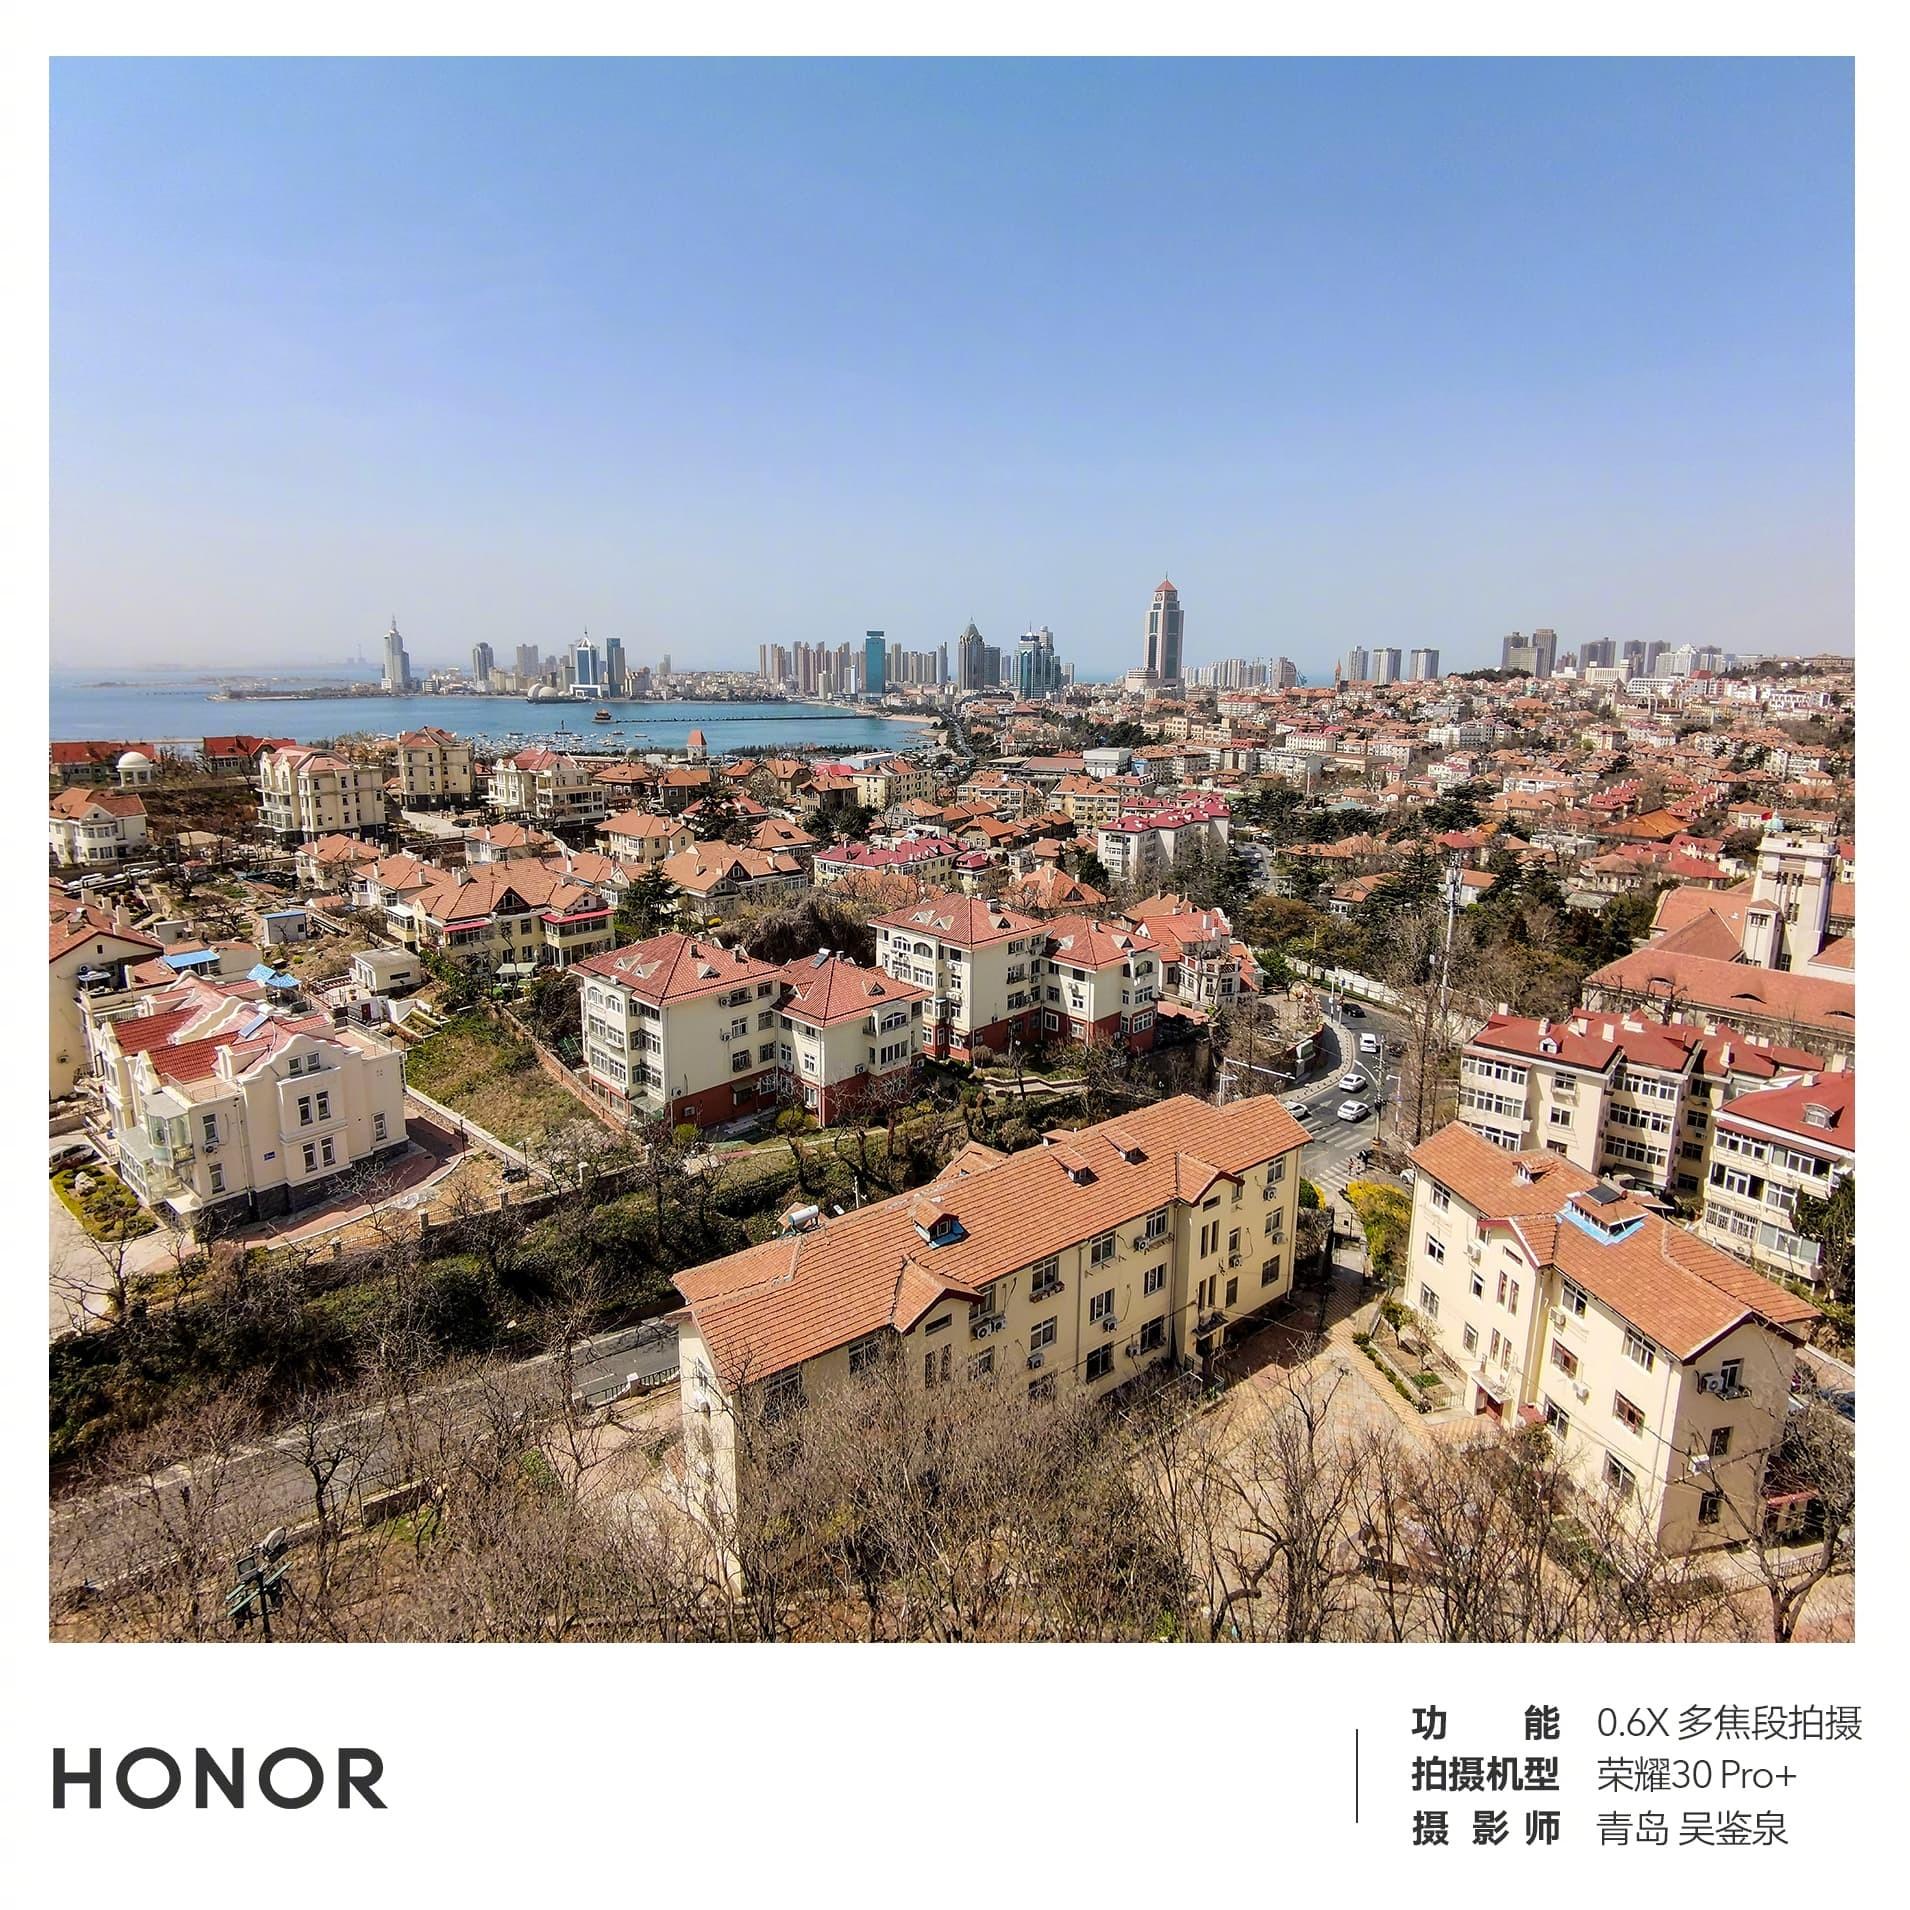 Honor 30 Pro + wide angle camera sample